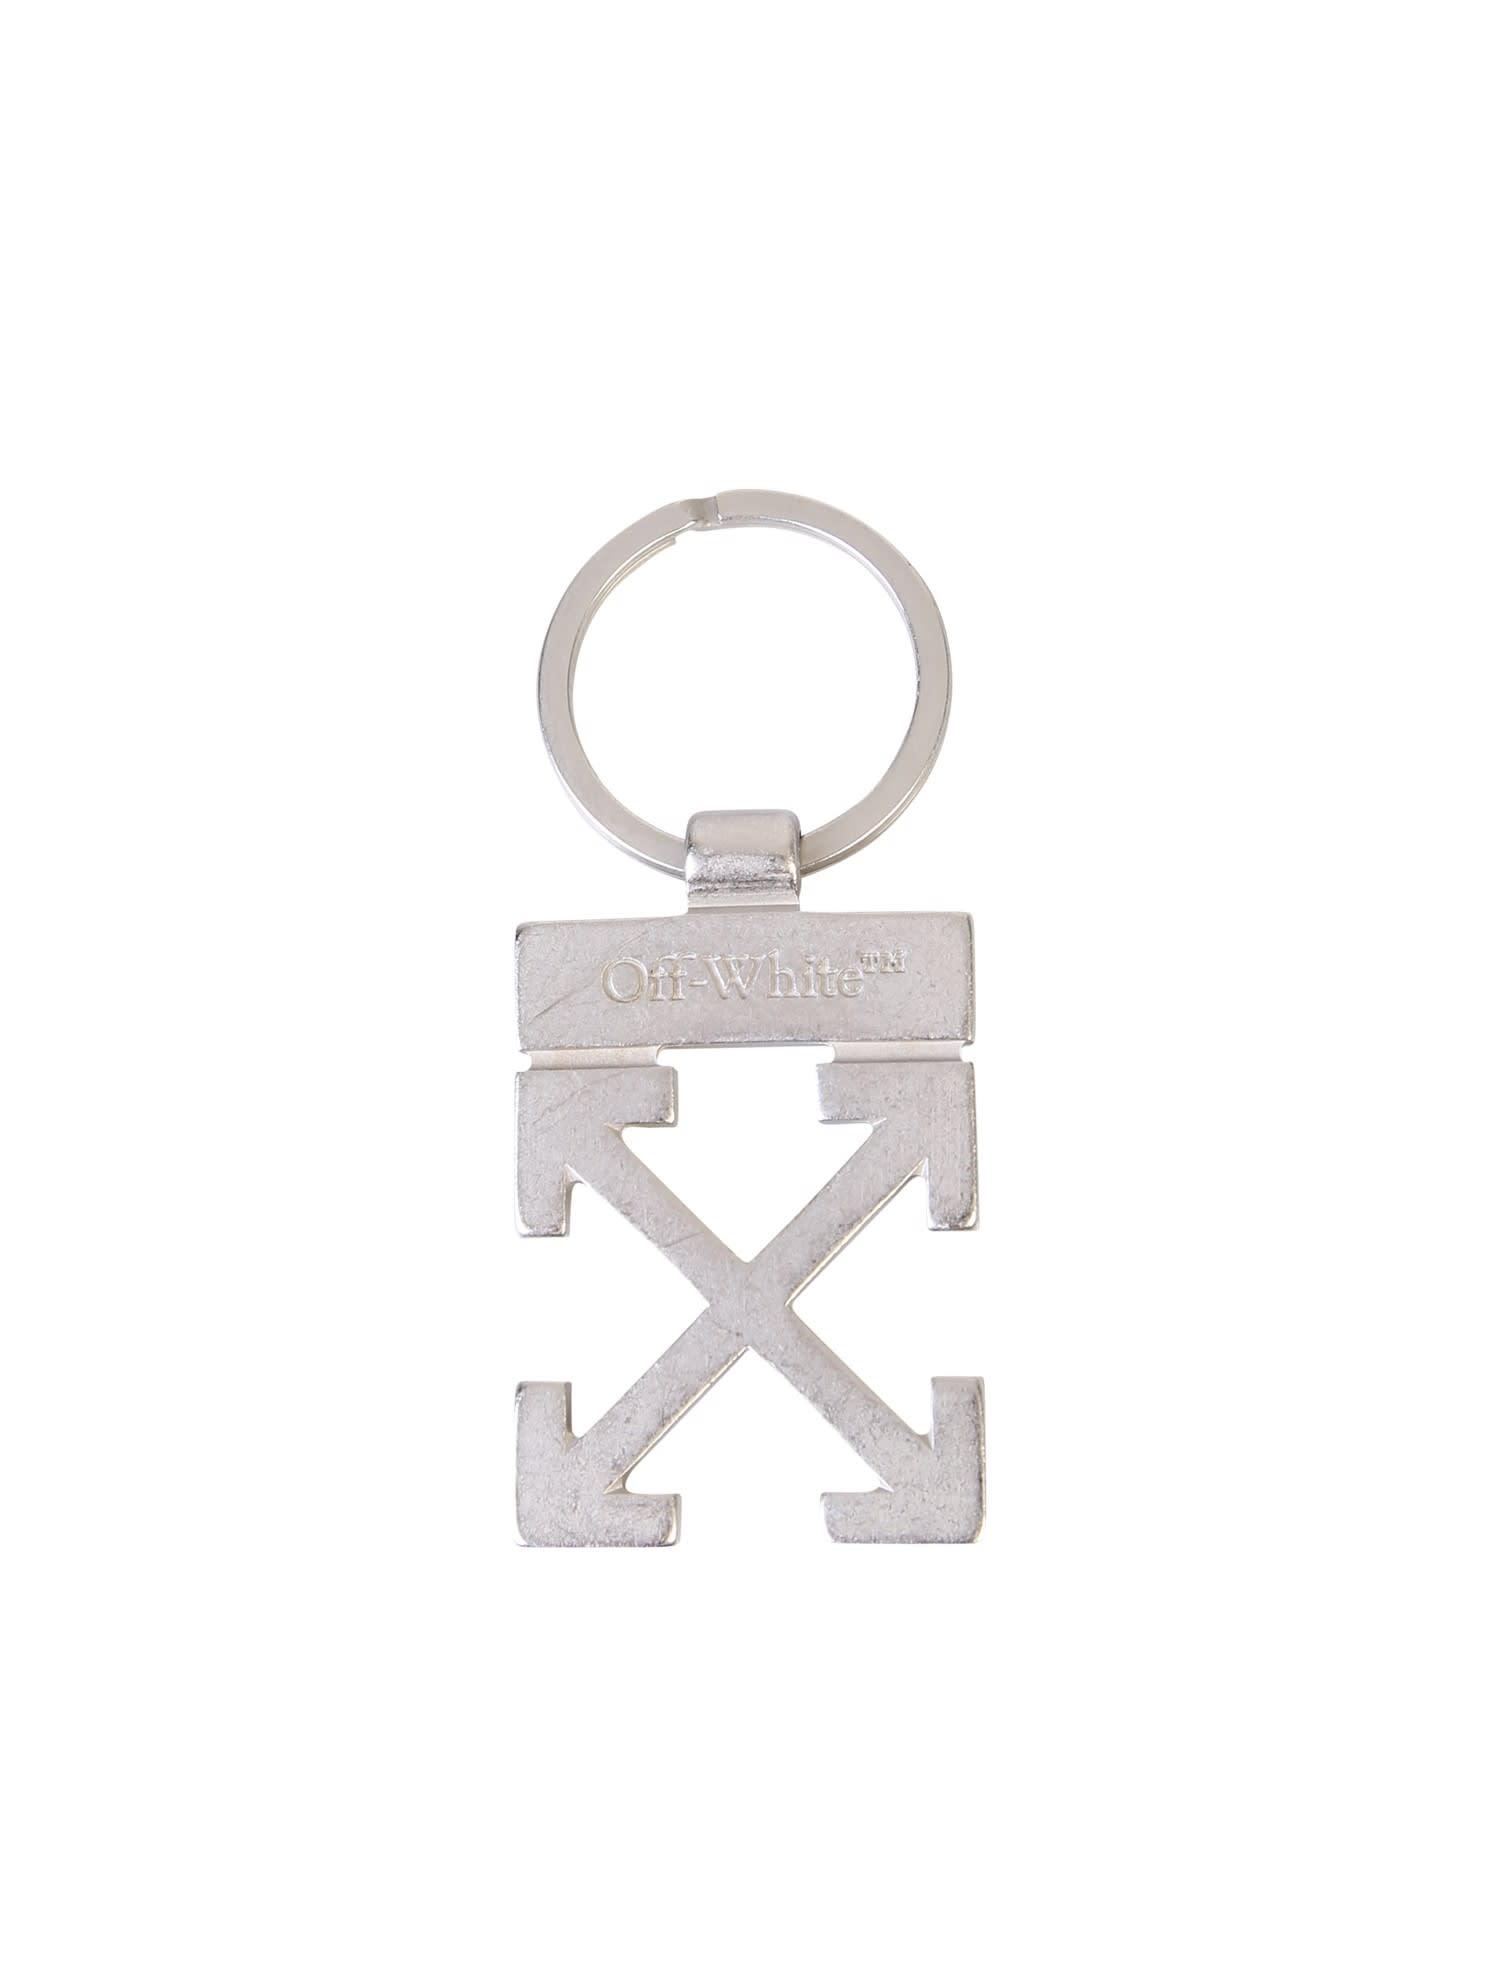 Off-White Branded Keychain